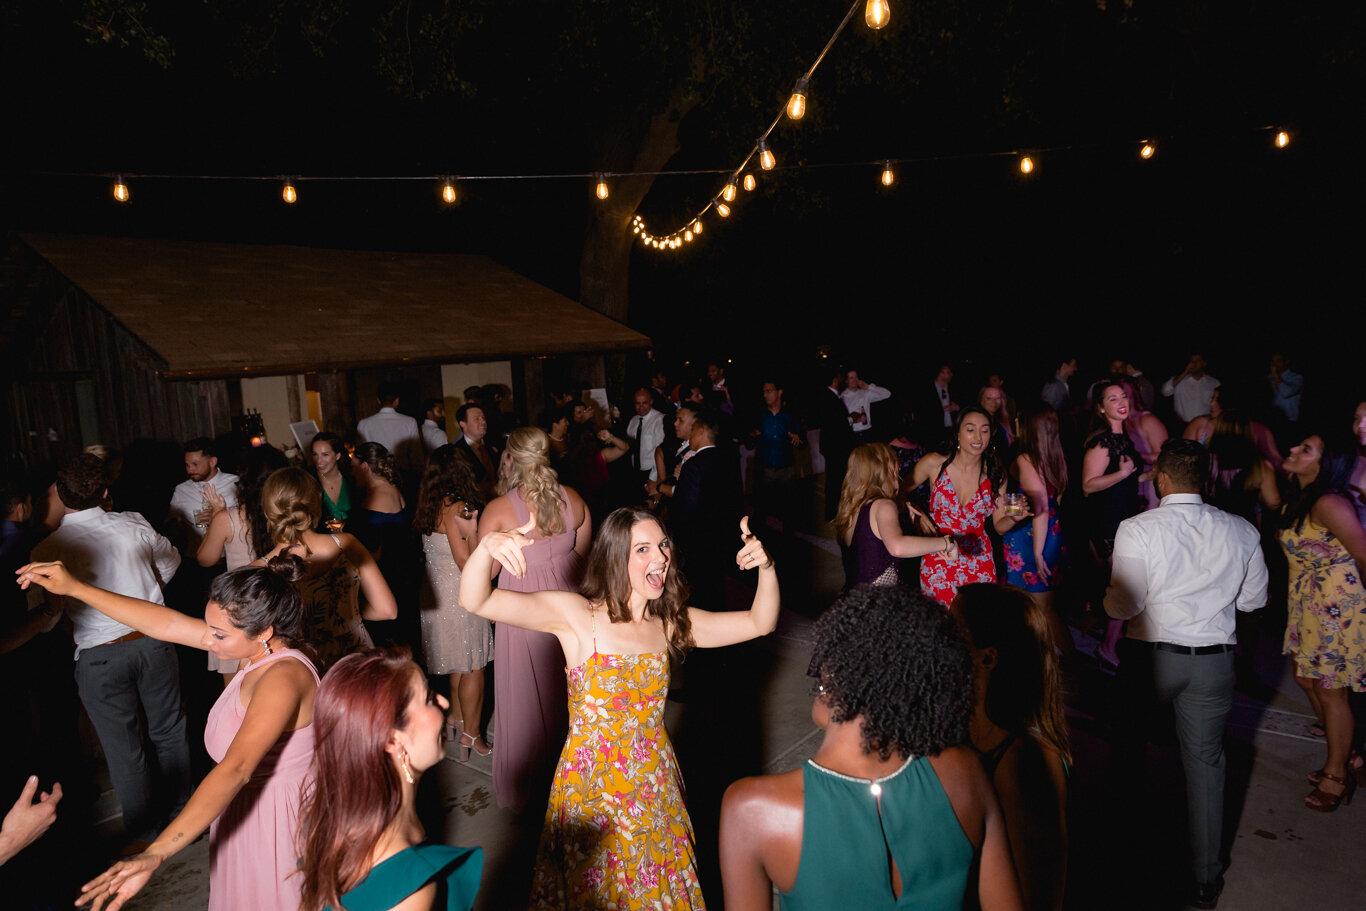 2019.08.24_Emily-Ashir-Wedding-at-the-Maples-6625.jpg